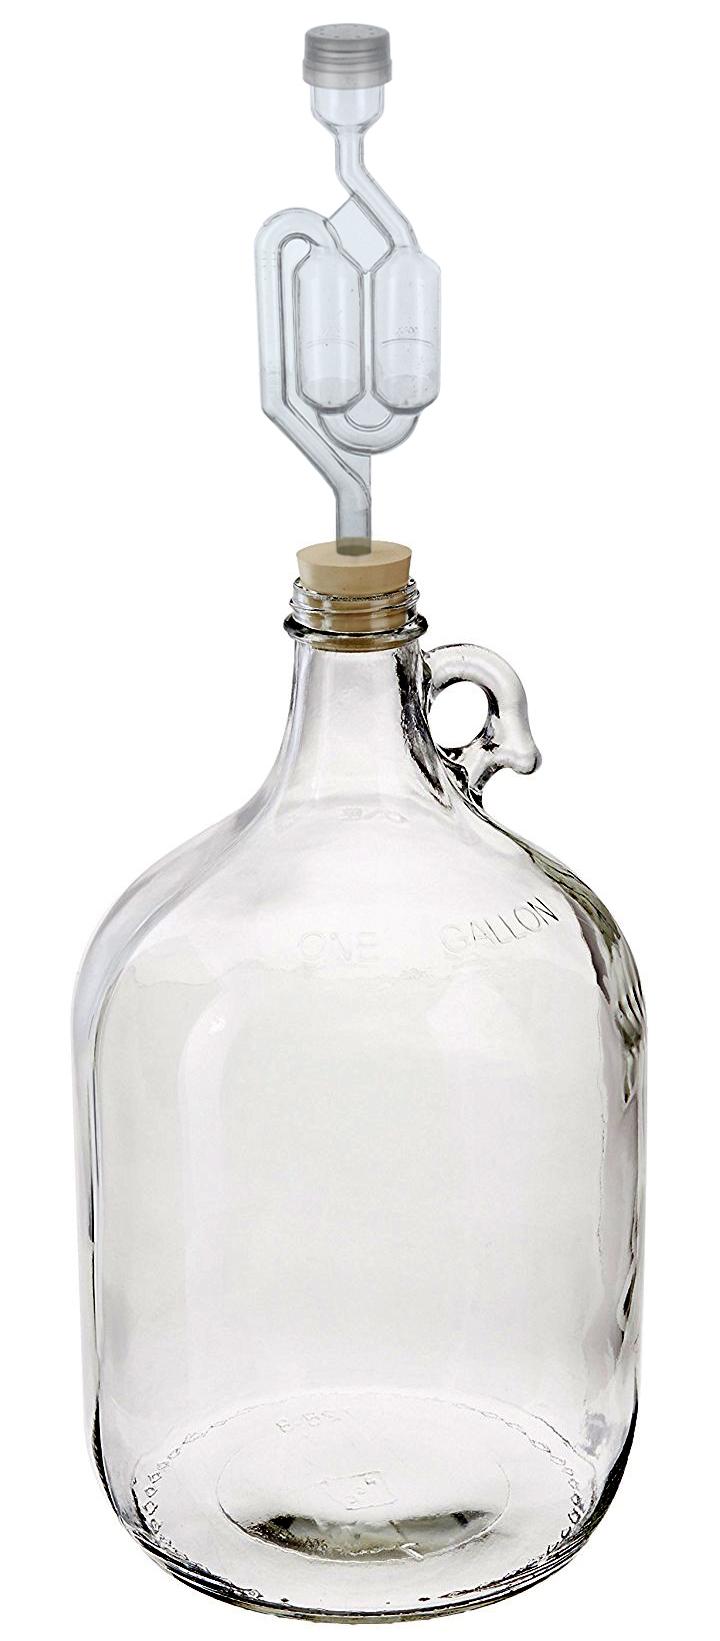 1 Gallon Glass Wine Fermenter #6 Drilled Rubber Stopper and Twin Bubble Airlock